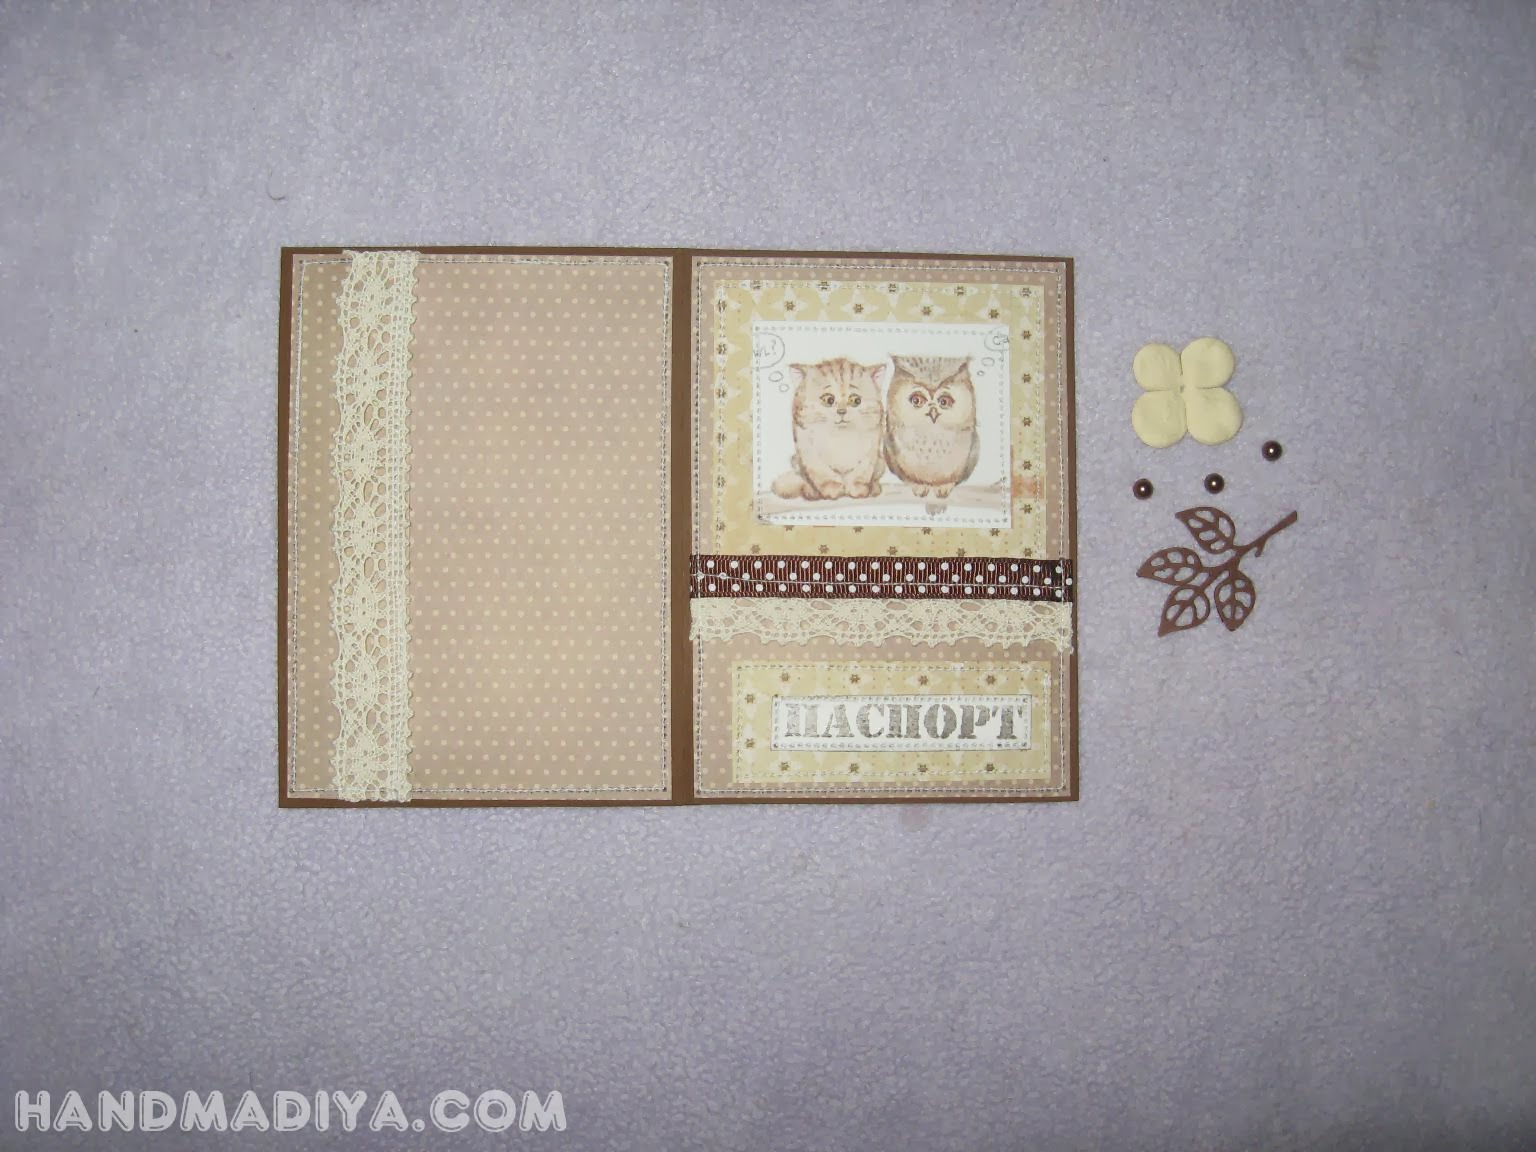 Обложка для паспорта, мастер класс. Passport cover scrapbooking. DIY step-by-step tutorials